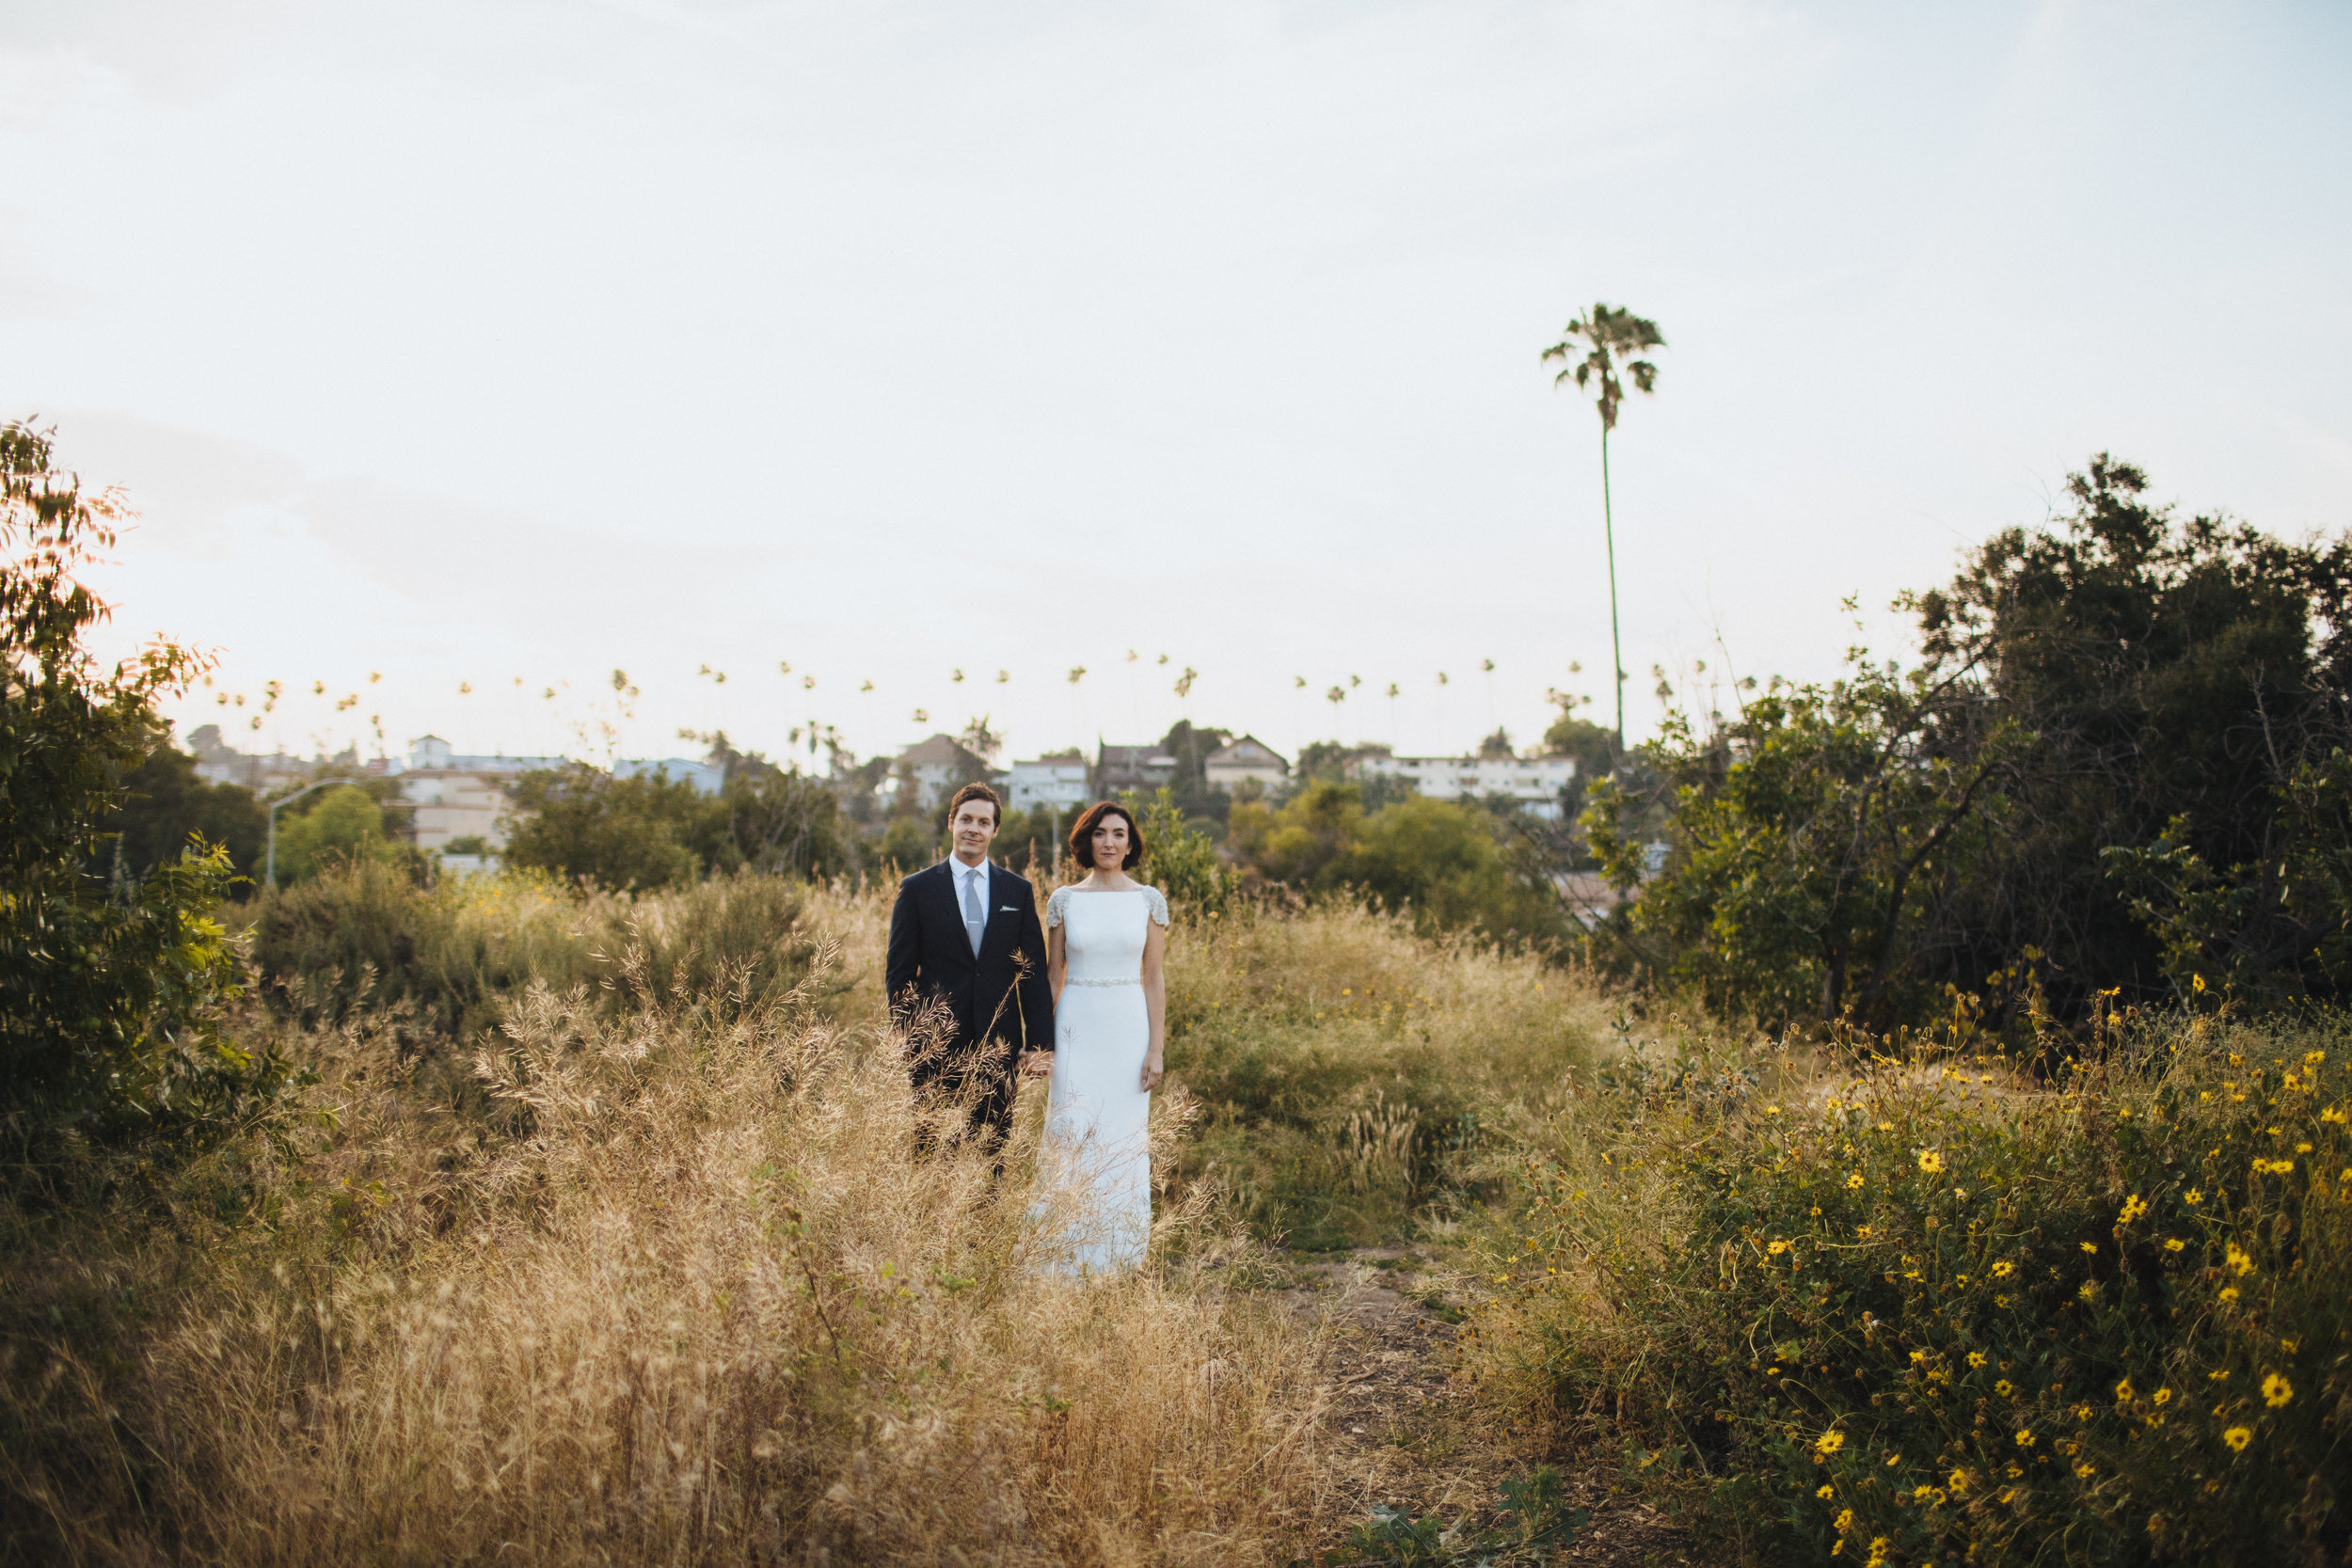 Los Angeles Wedding, Sunset Portraits, Photographer: Rad + In Love, Art & Soul Events, Ruby Street Wedding Venue